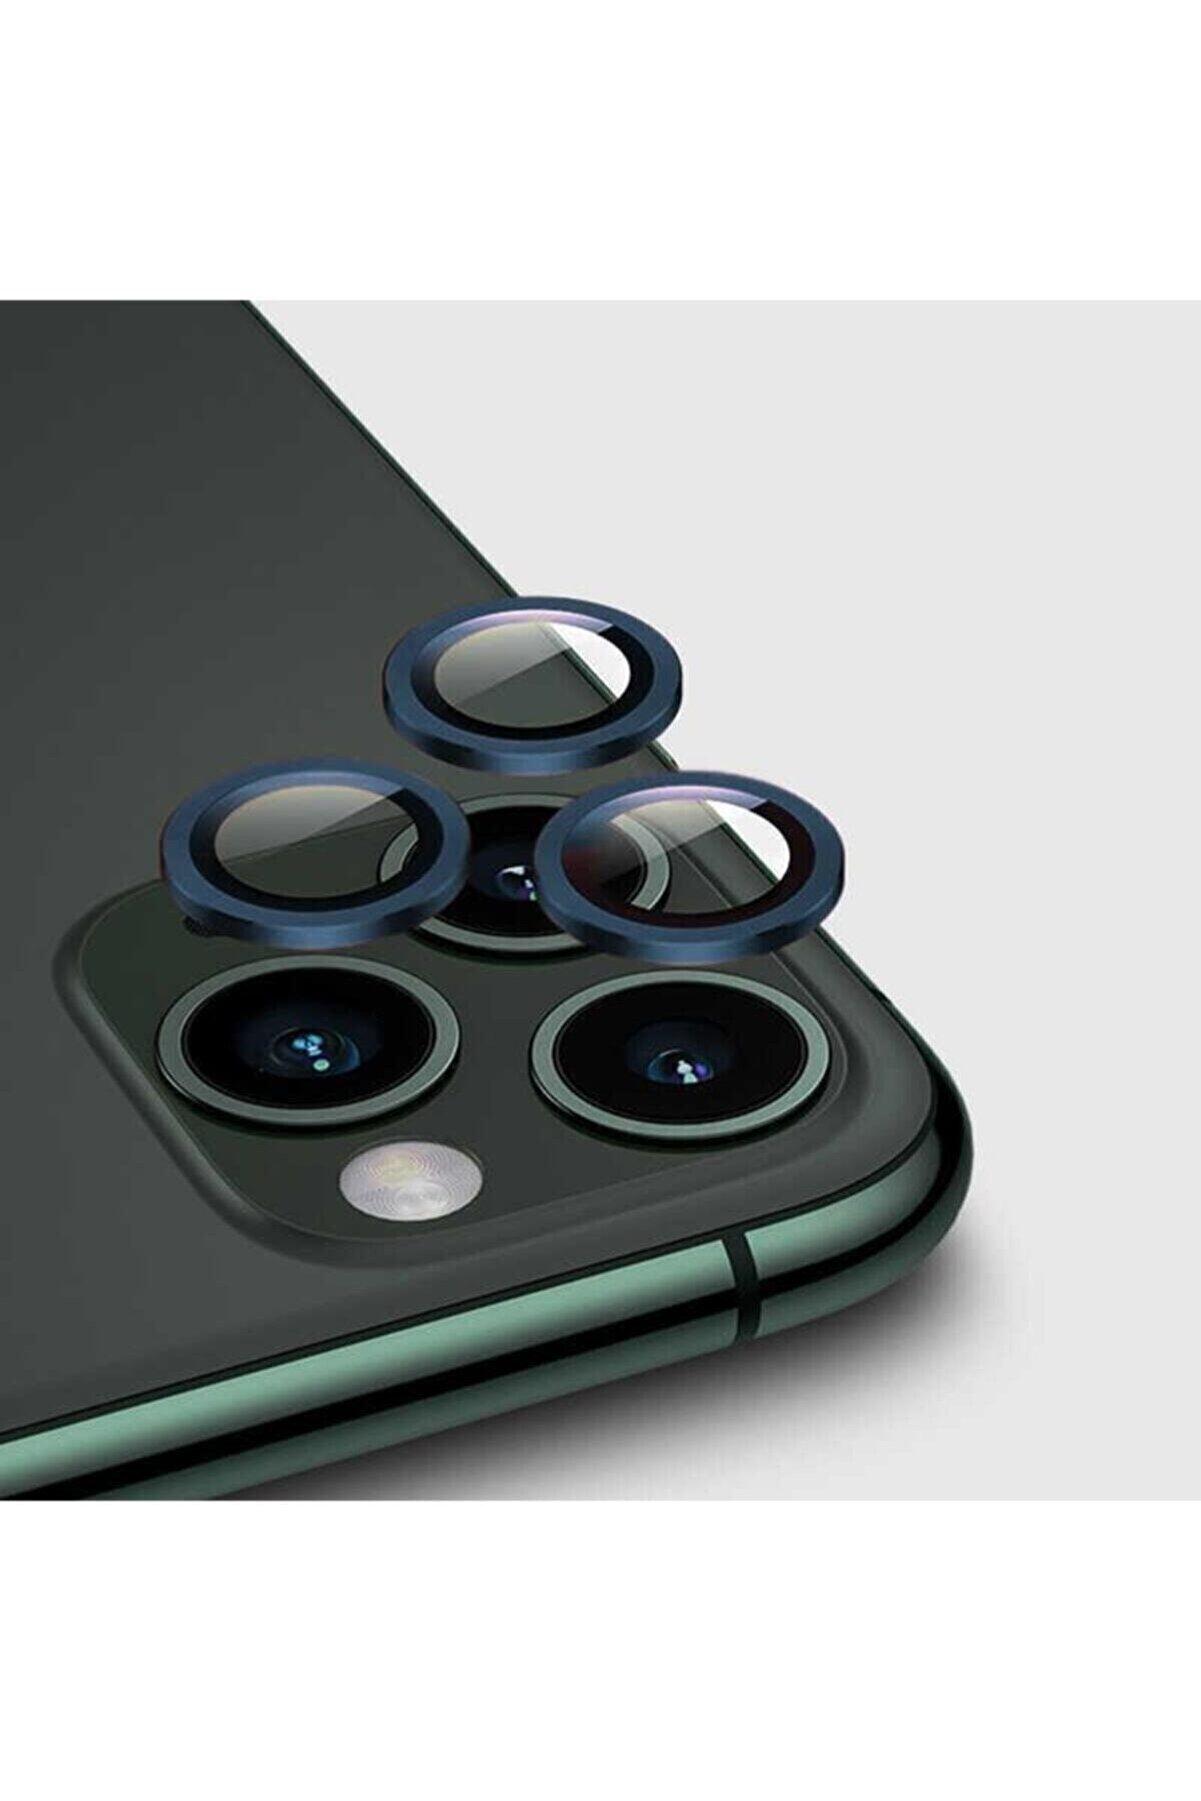 Zore Iphone 12 Pro Max Cl-02 Kamera Lens Koruyucu